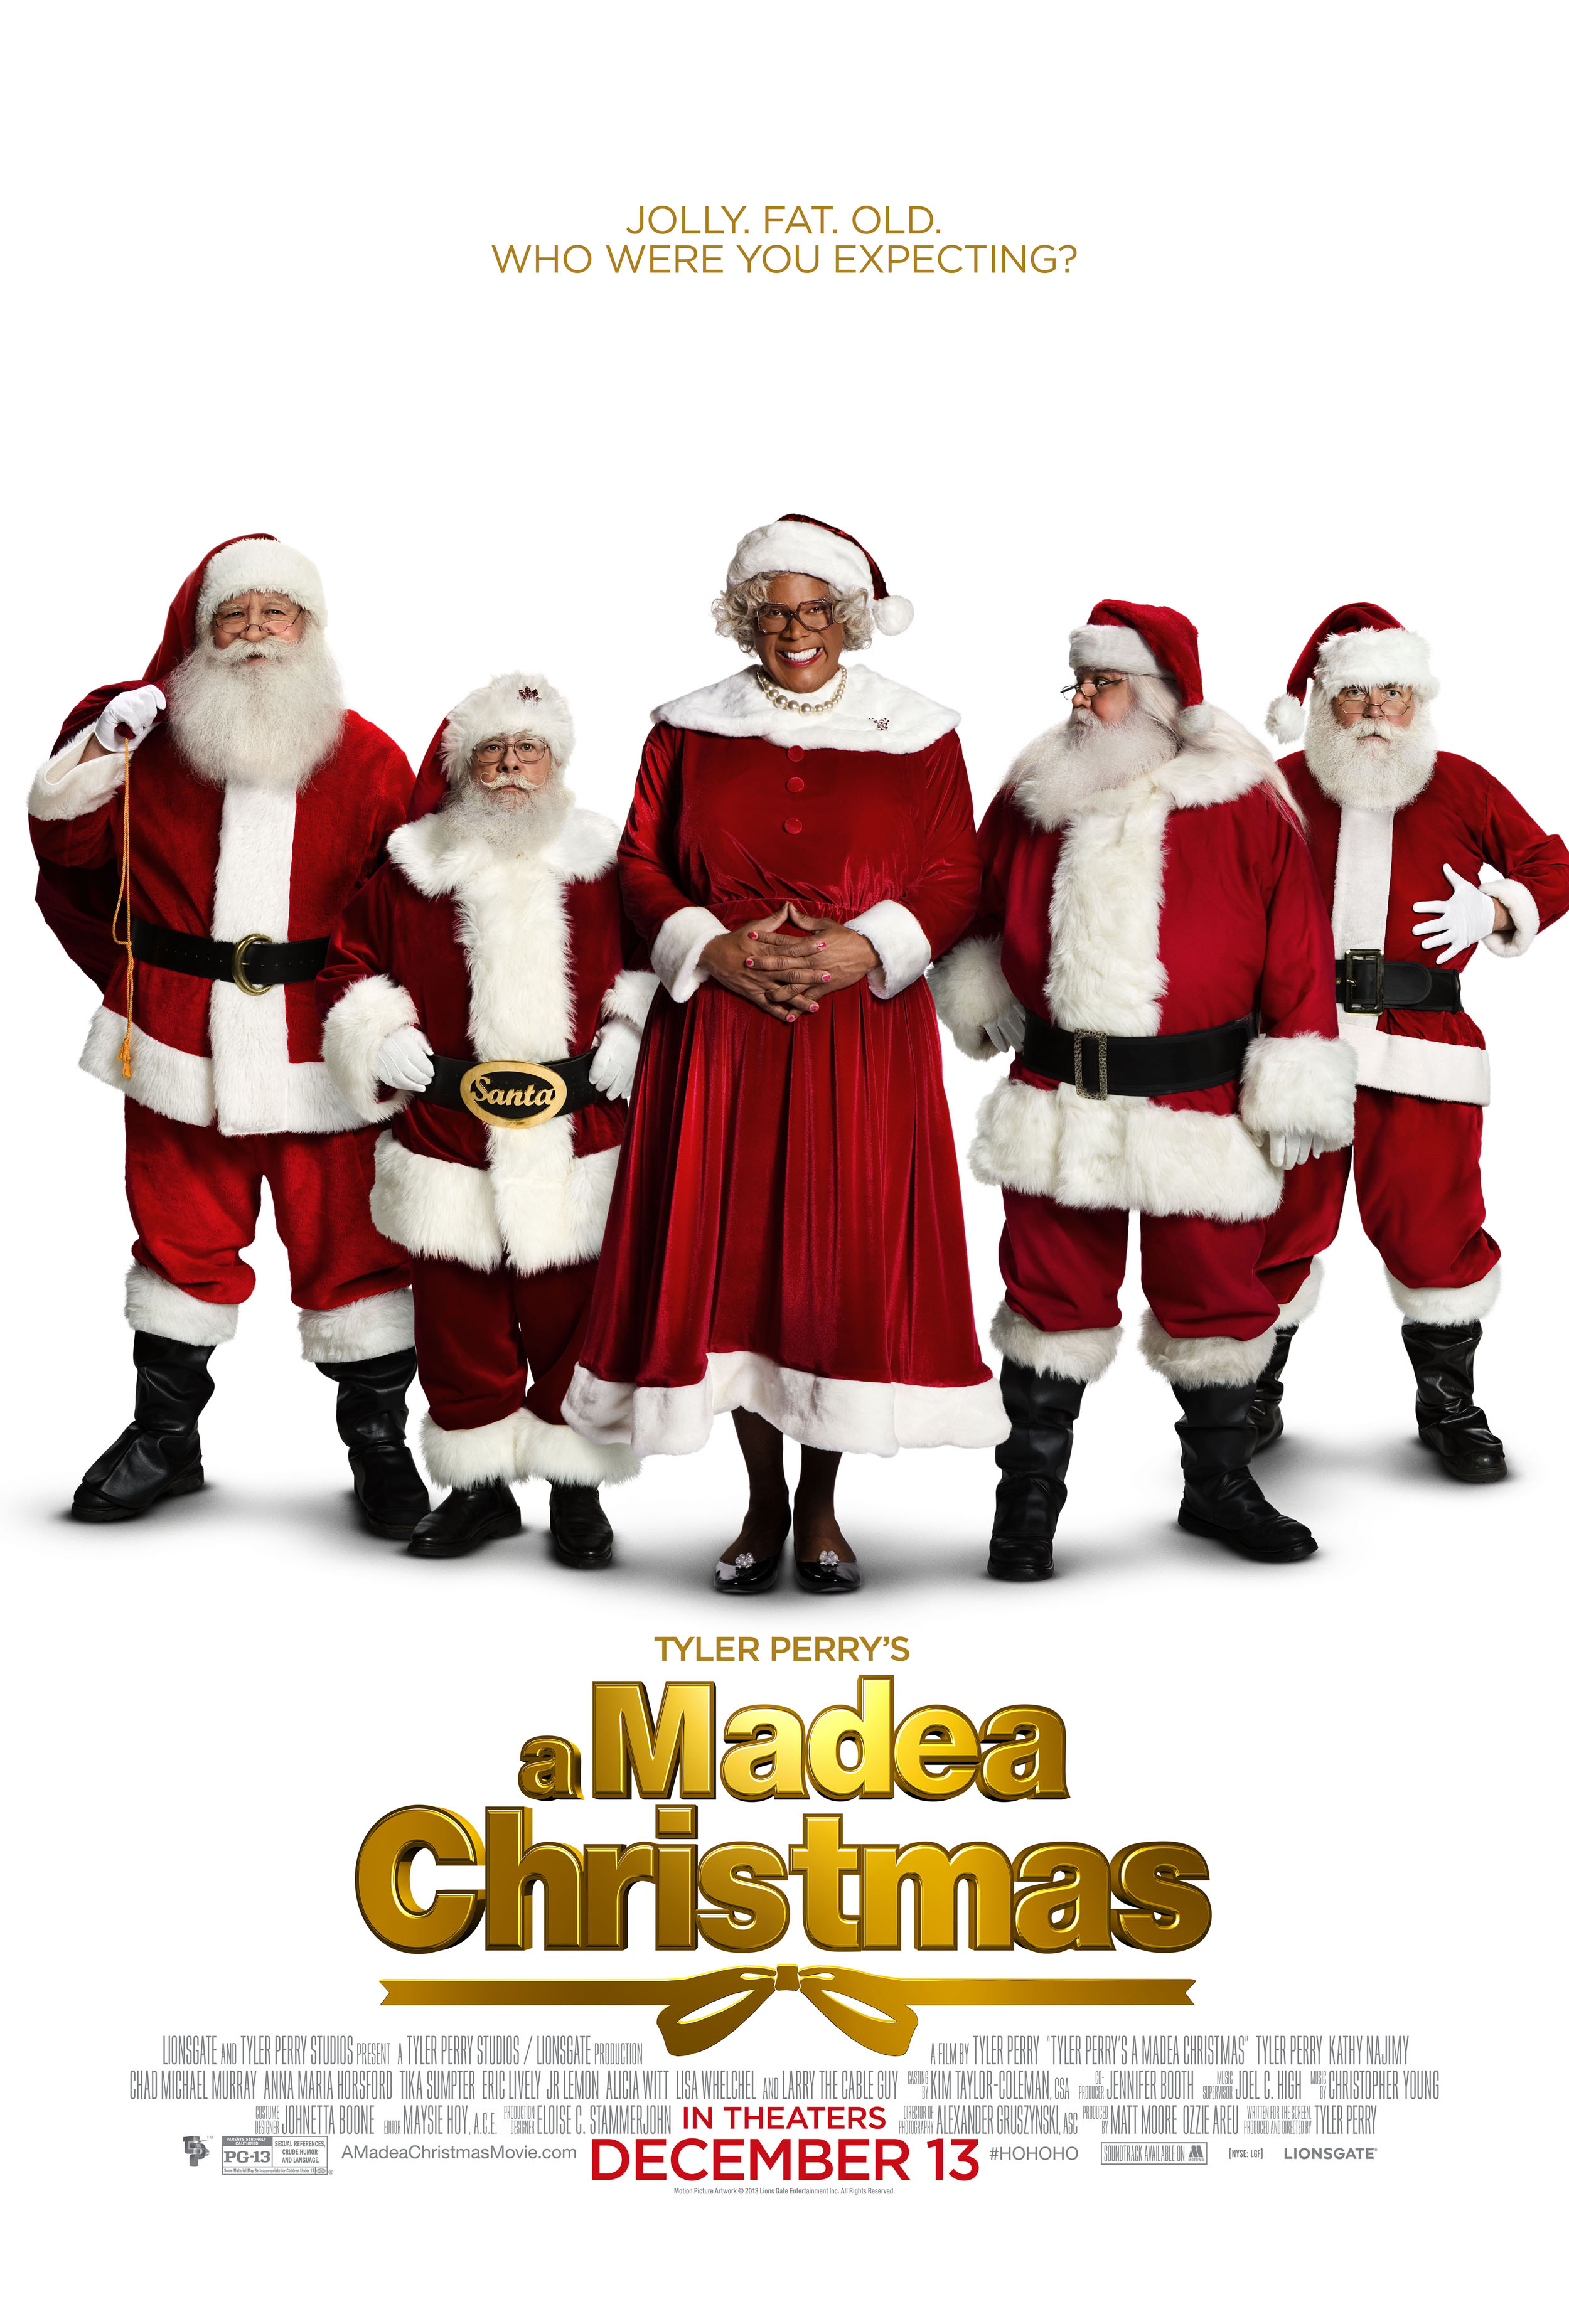 a-madea-christmas-poster-big.jpg